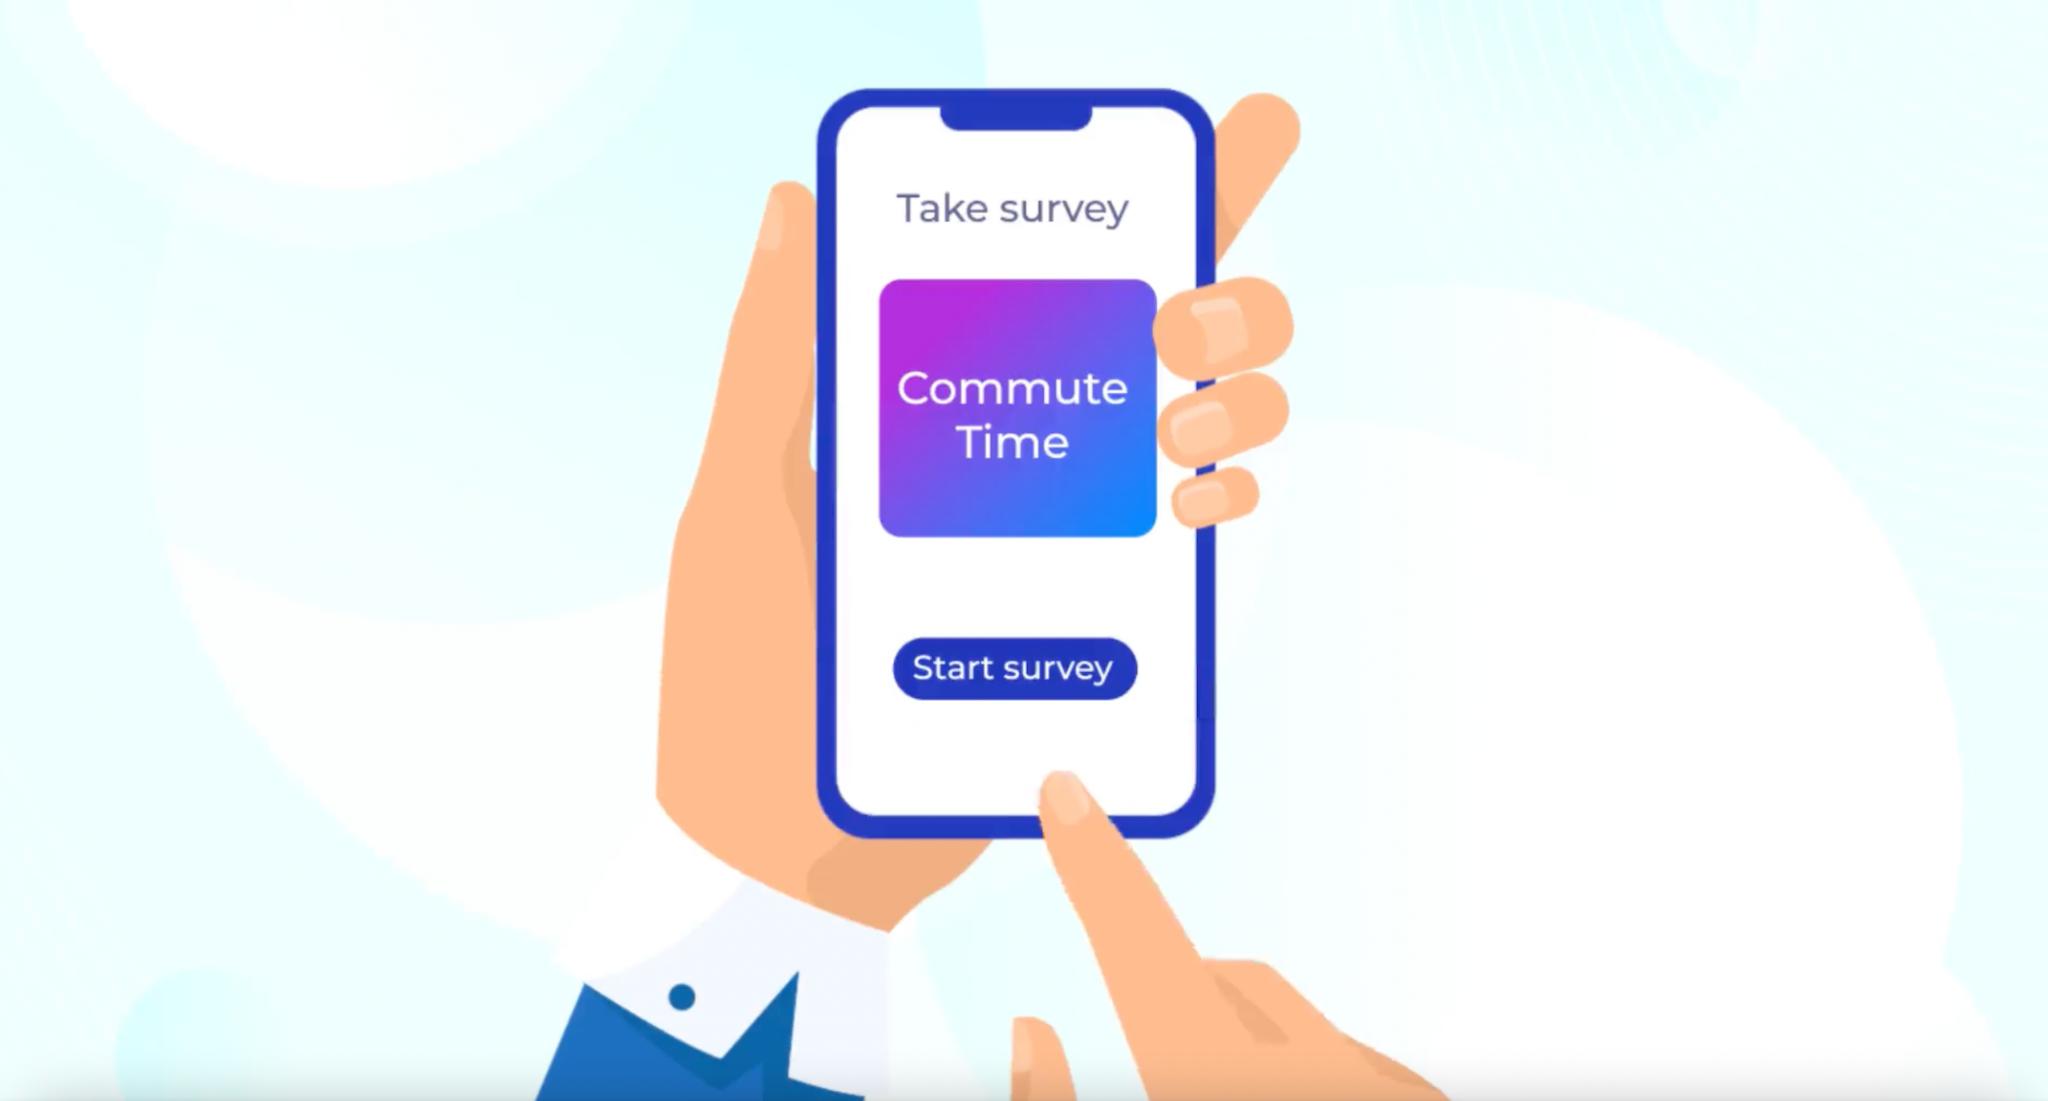 A sample survey on ARCC.one.